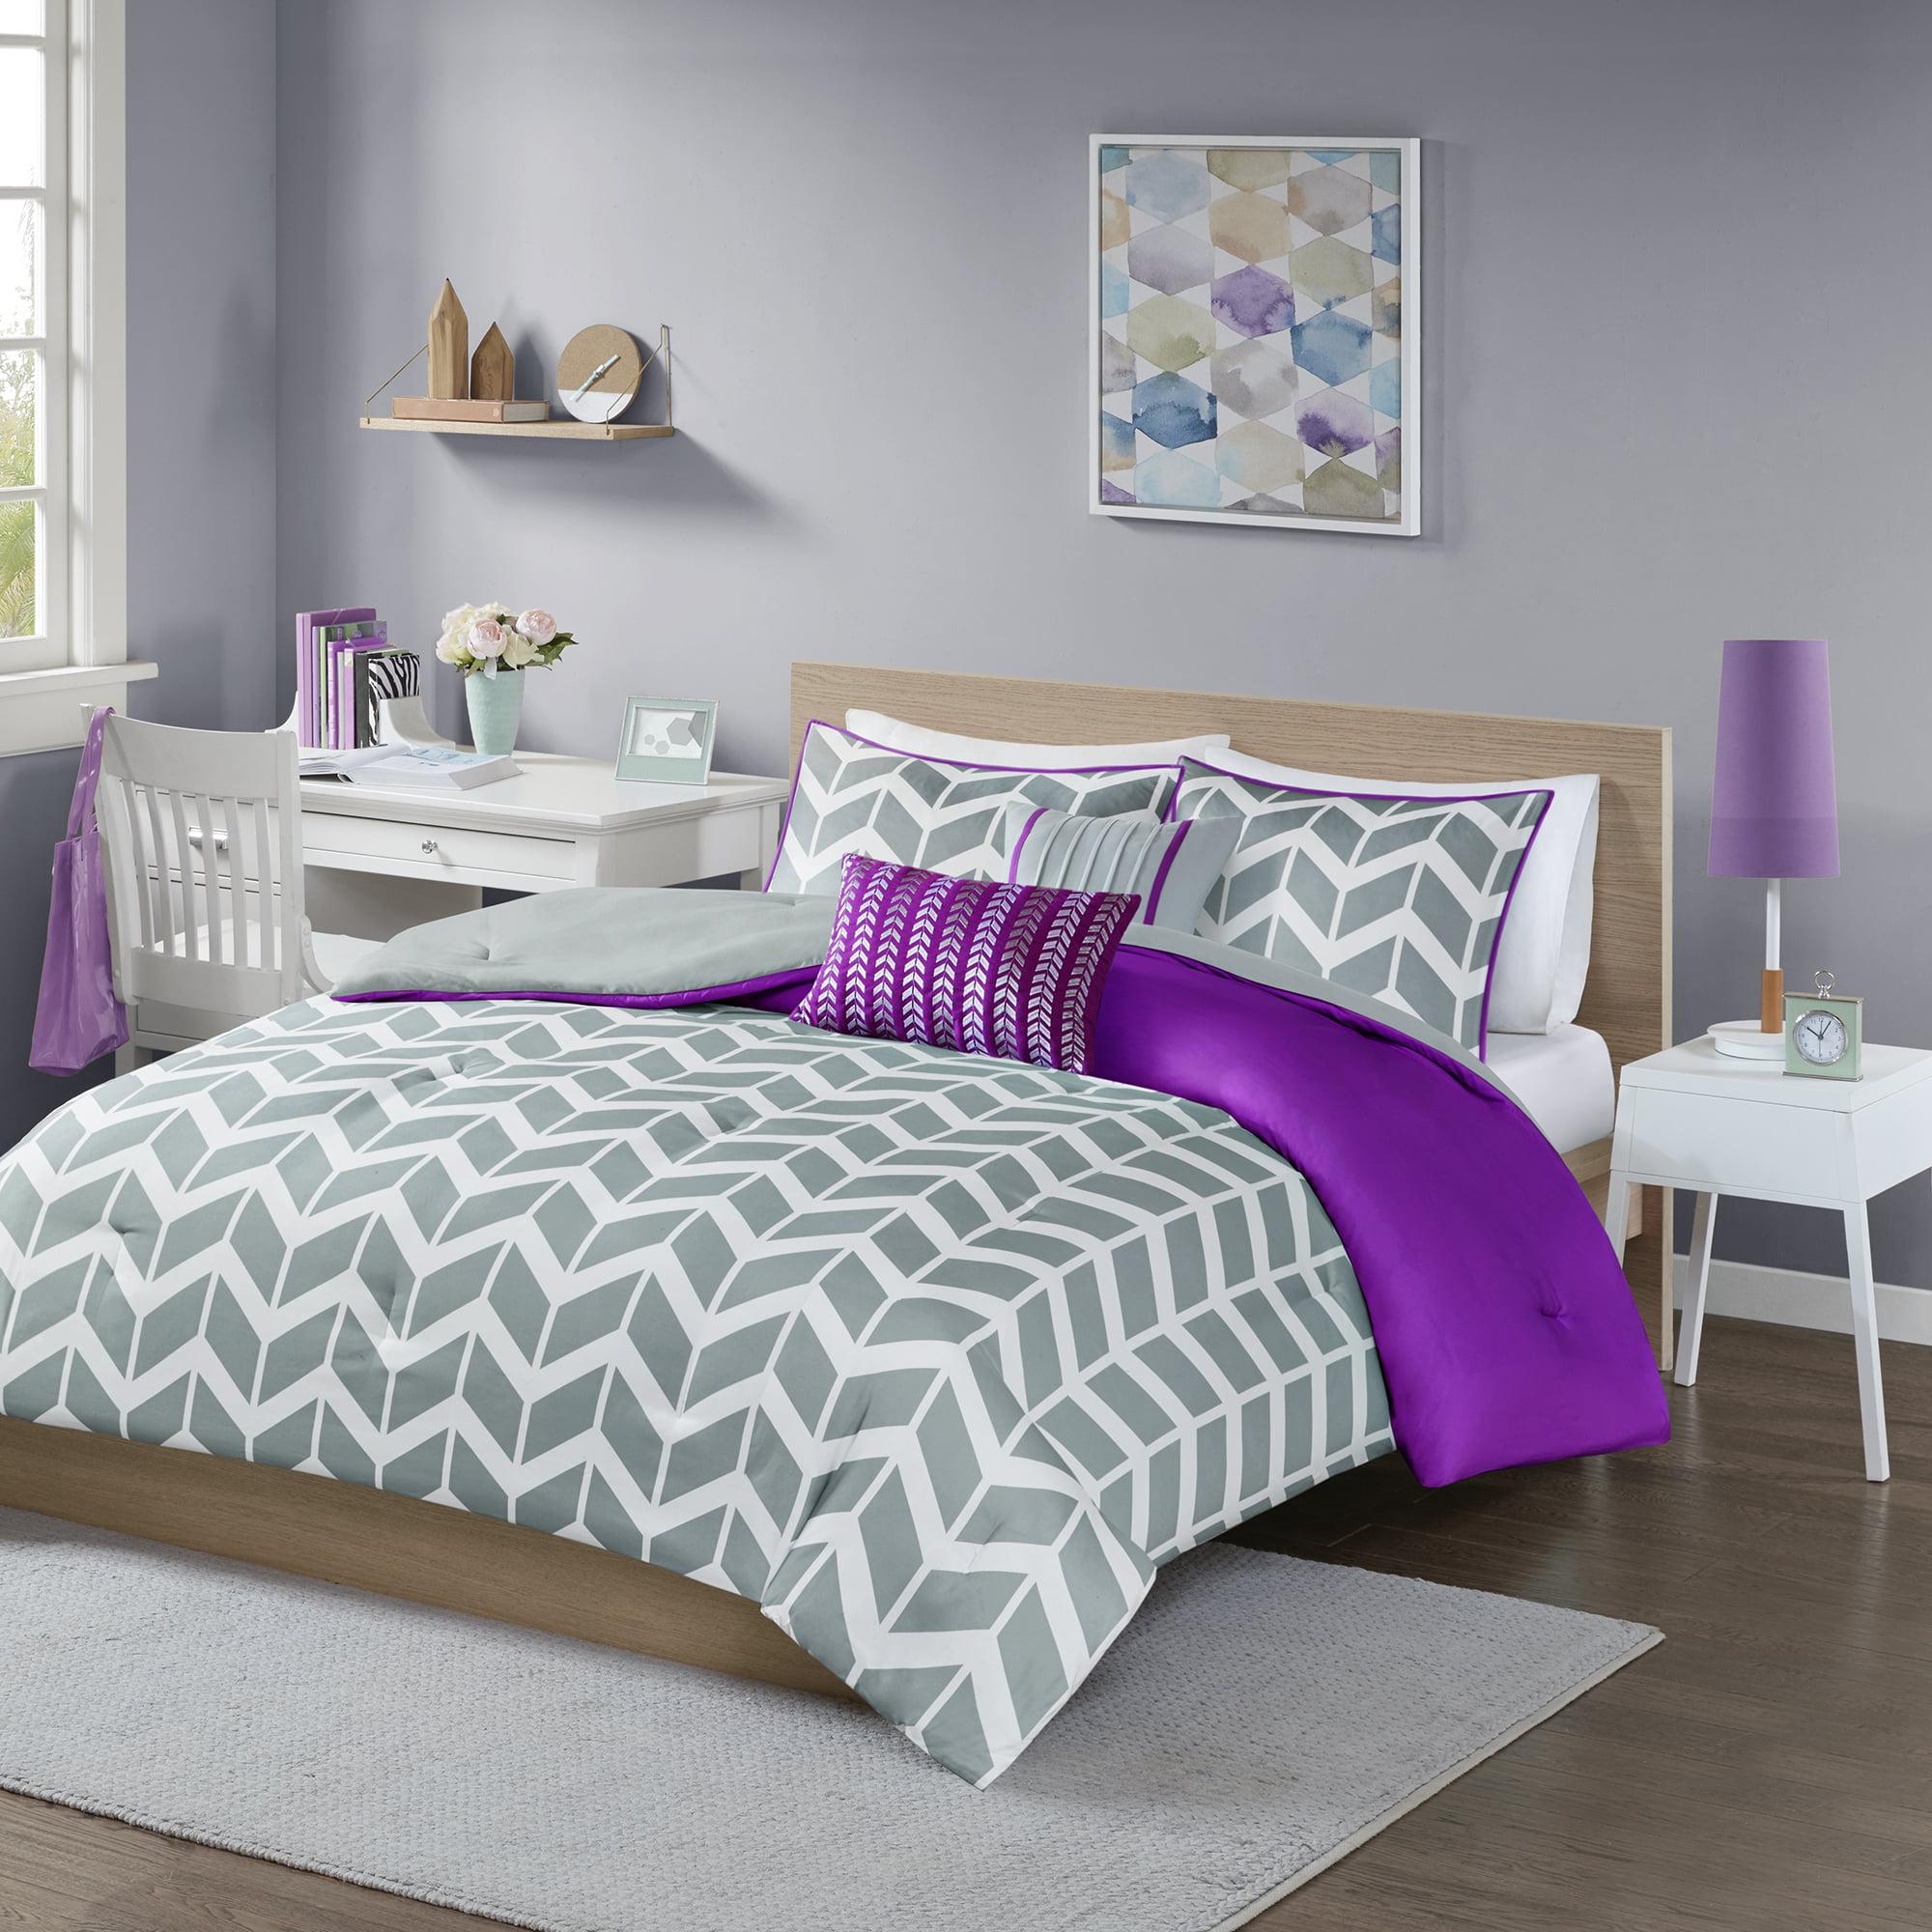 4-Piece Luxury Comforter Set in Gray Chevron, Twin